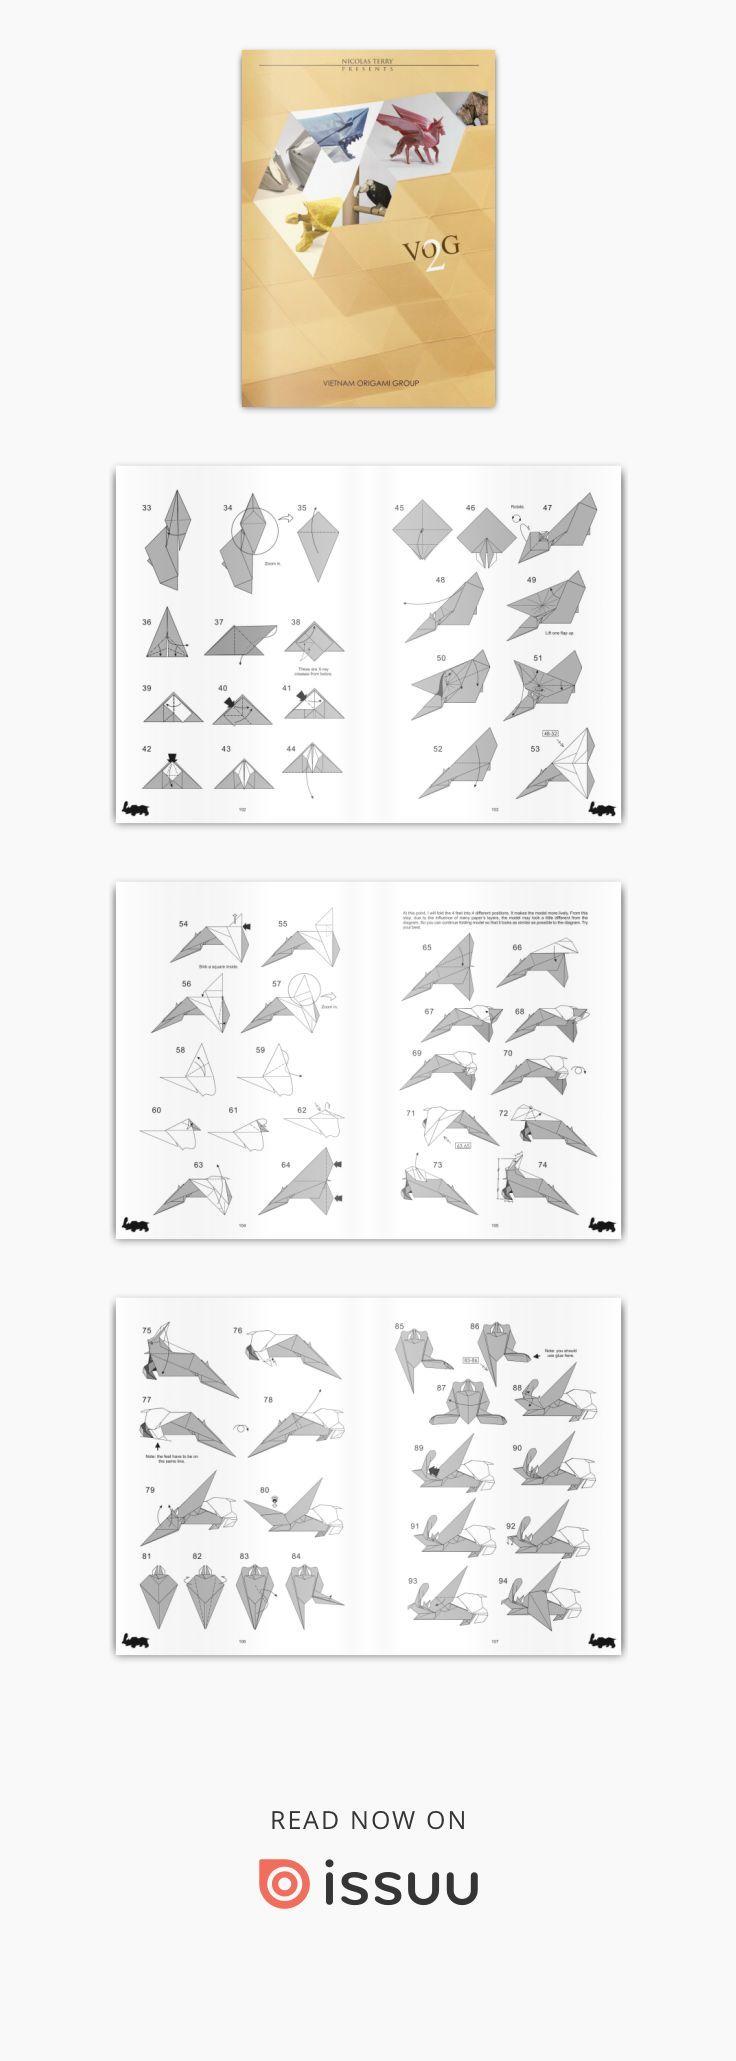 VOG 2.pdf | 2061x736